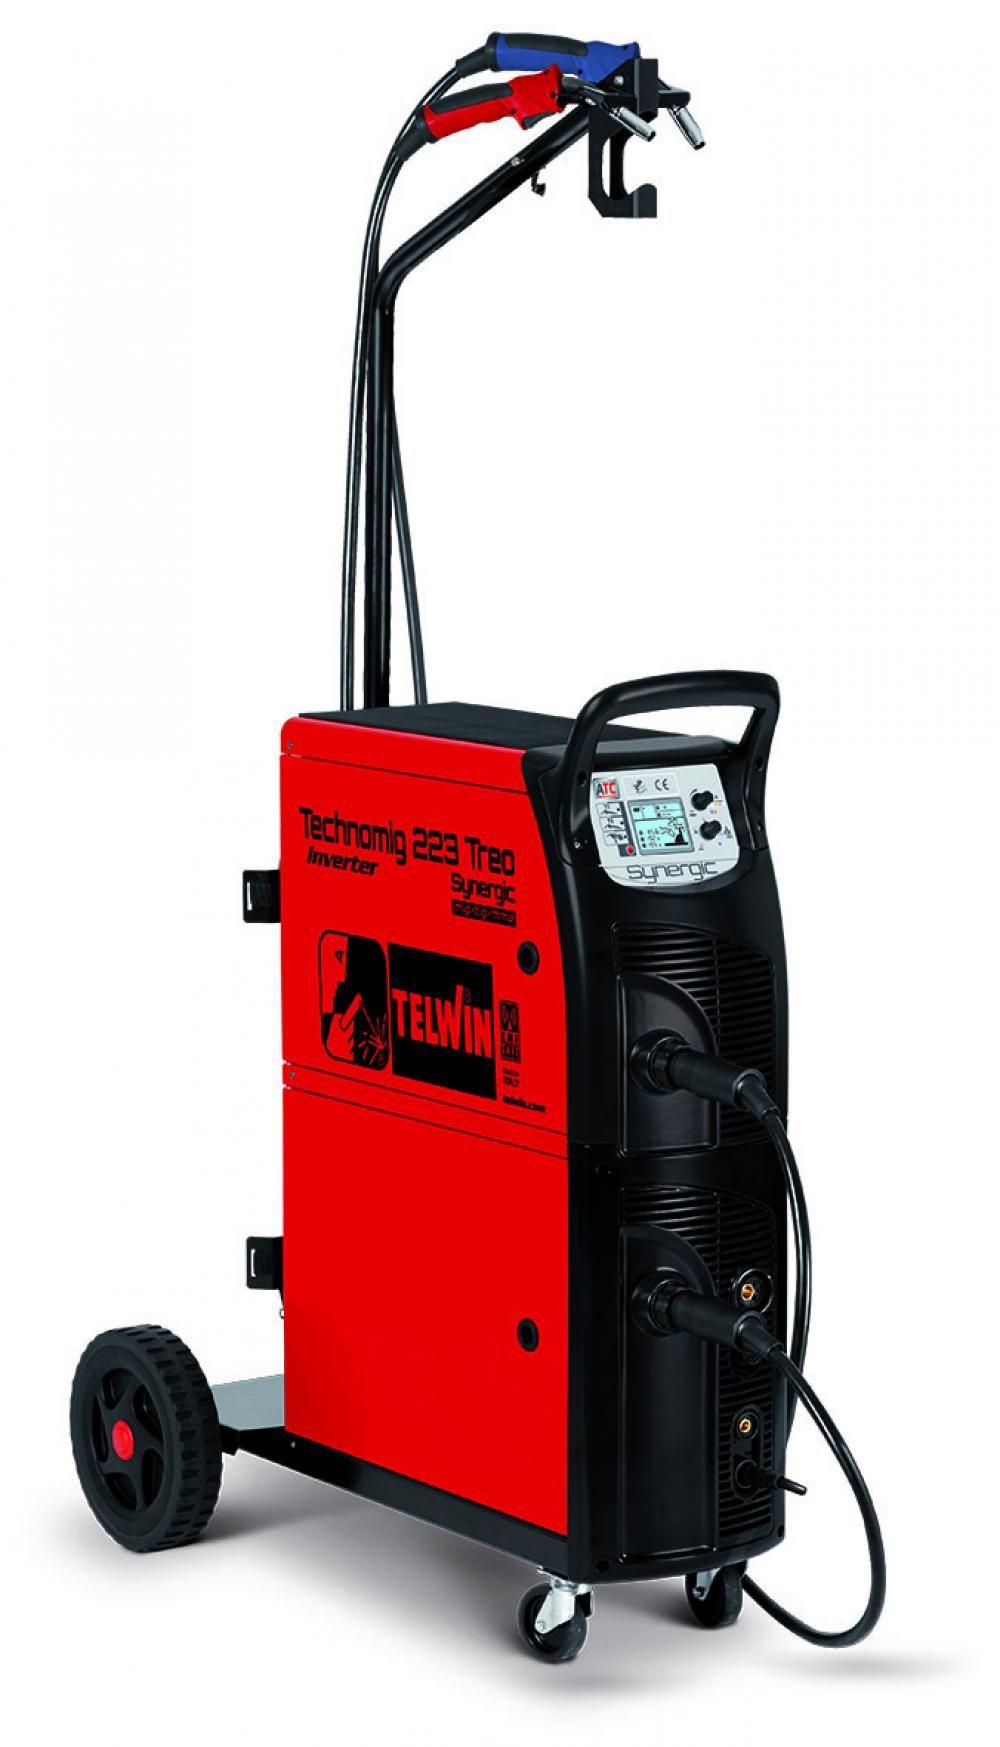 Telwin TECHNOMIG 223 TREO SYNERGIC 230V